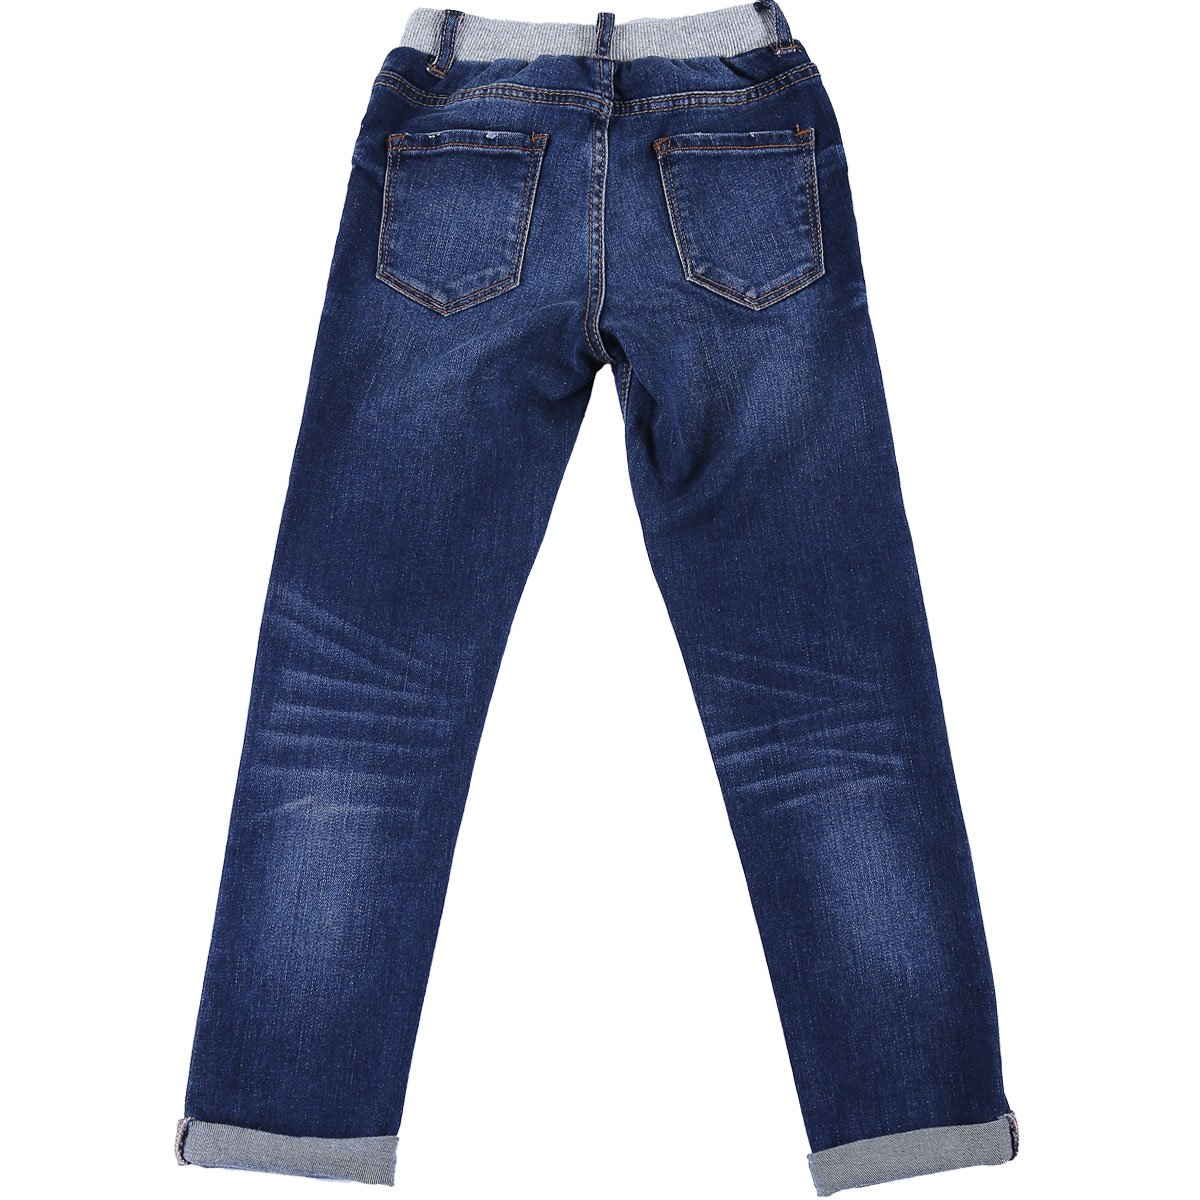 NABER Kids Girls Casual Slim Fit Elastic Waist Washed Denim Pants Jeans 4-14 Y